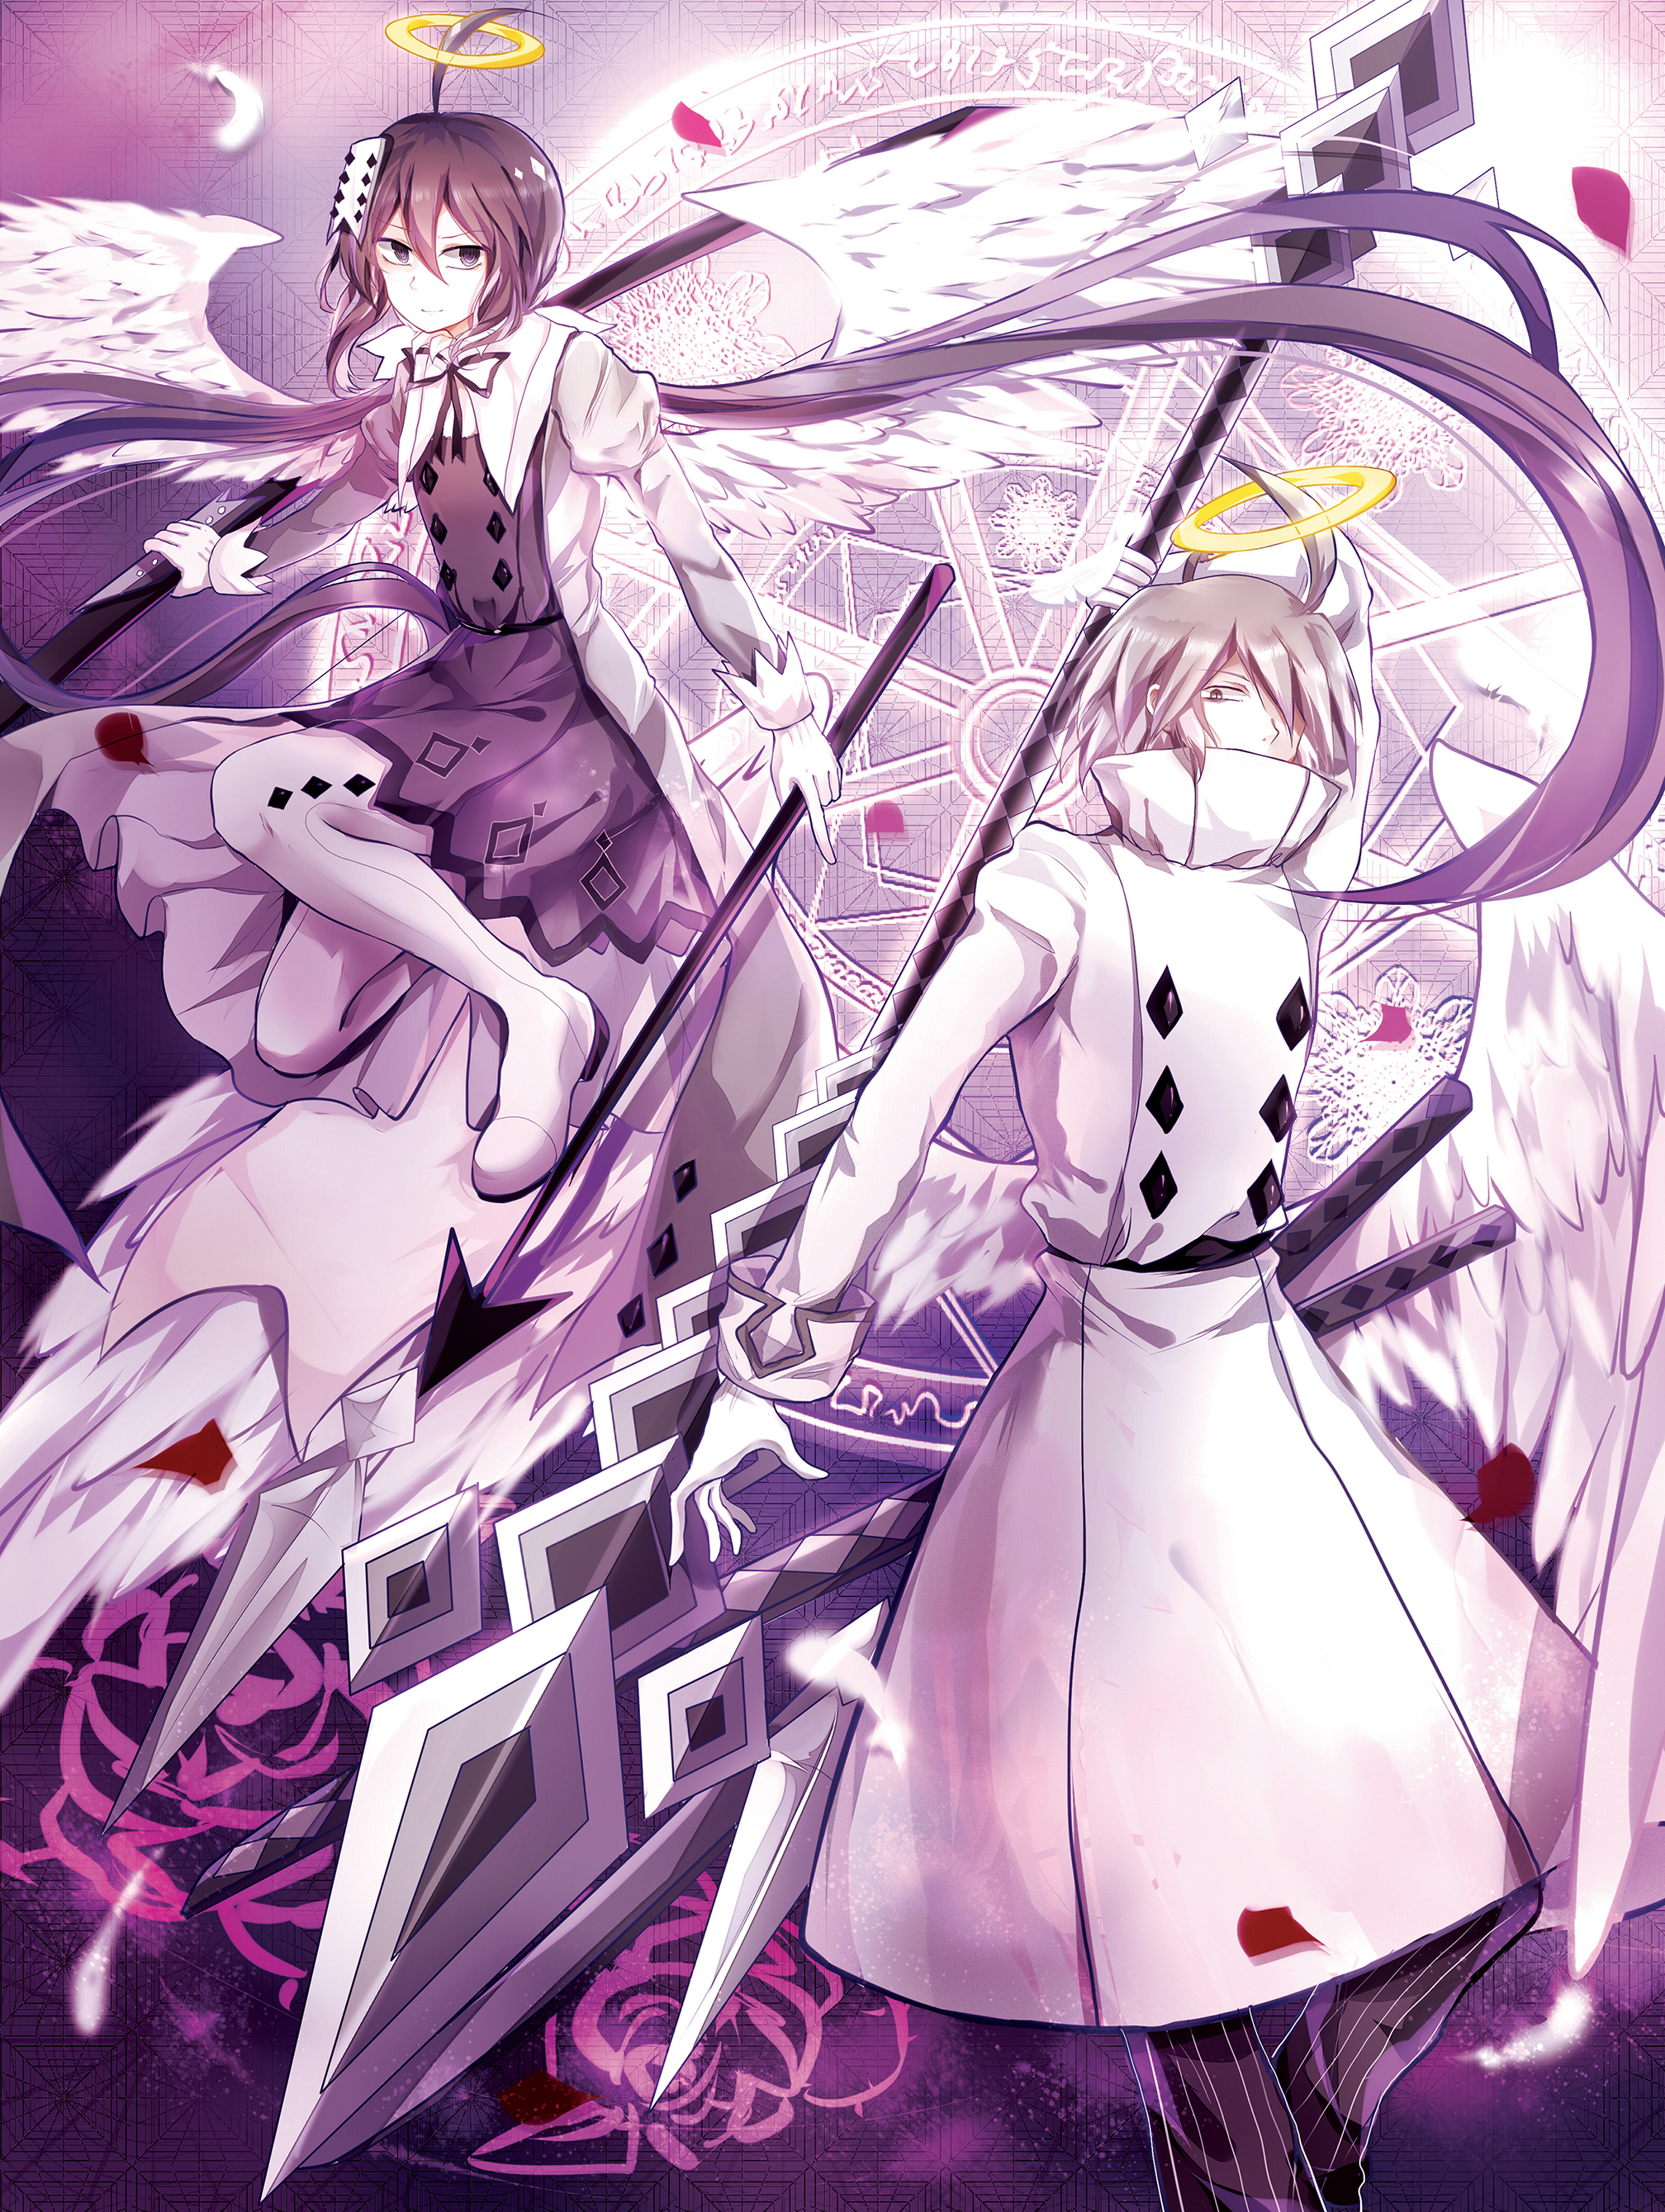 wodahs - gray garden - zerochan anime image board